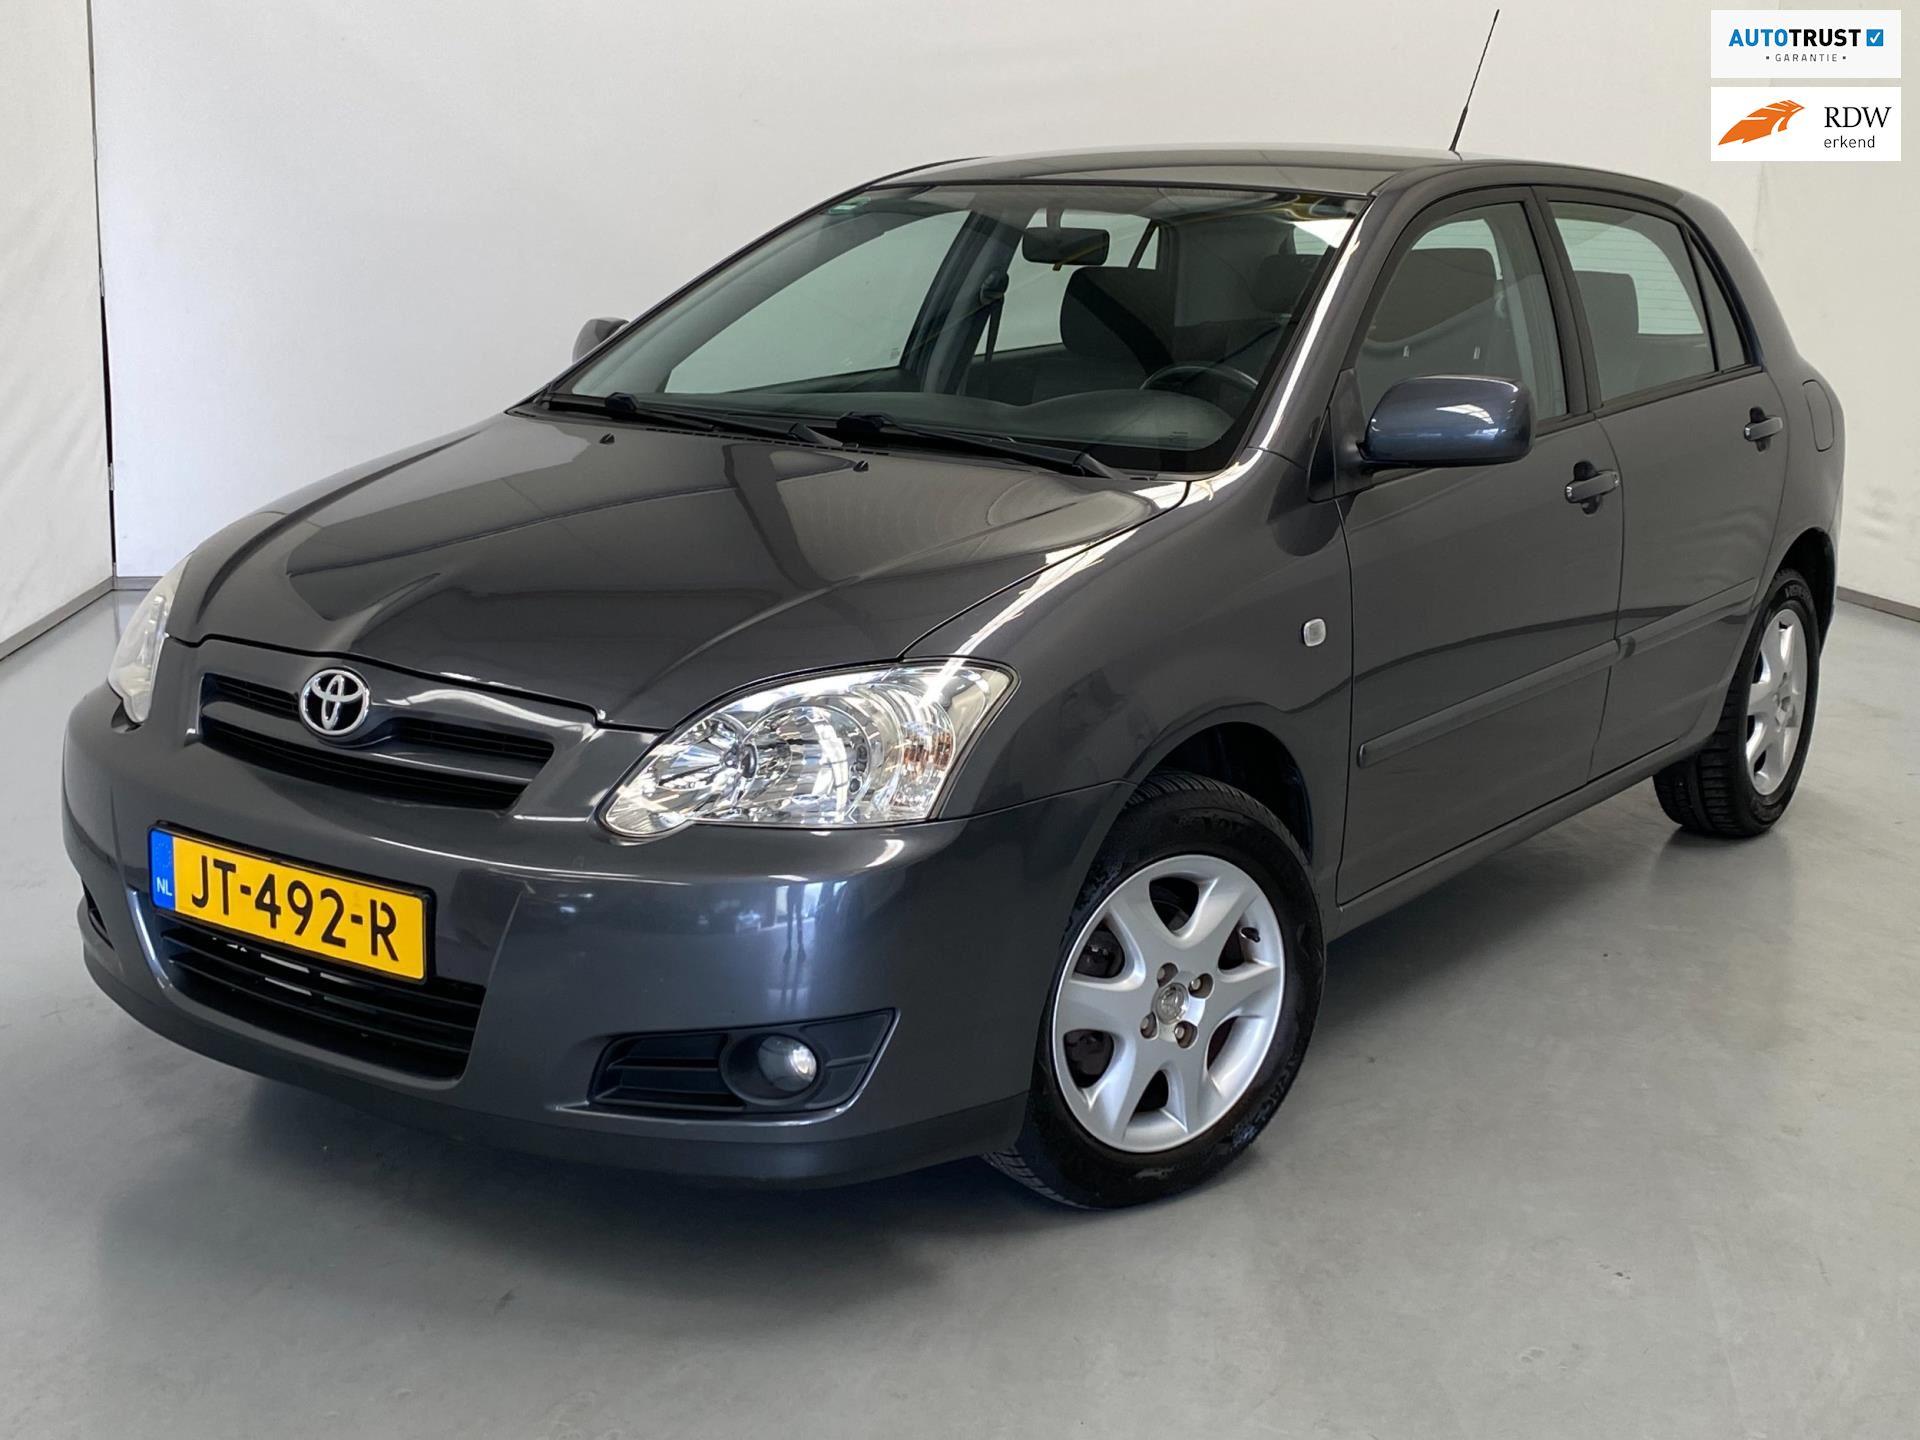 Toyota Corolla occasion - Van den Brink Auto's